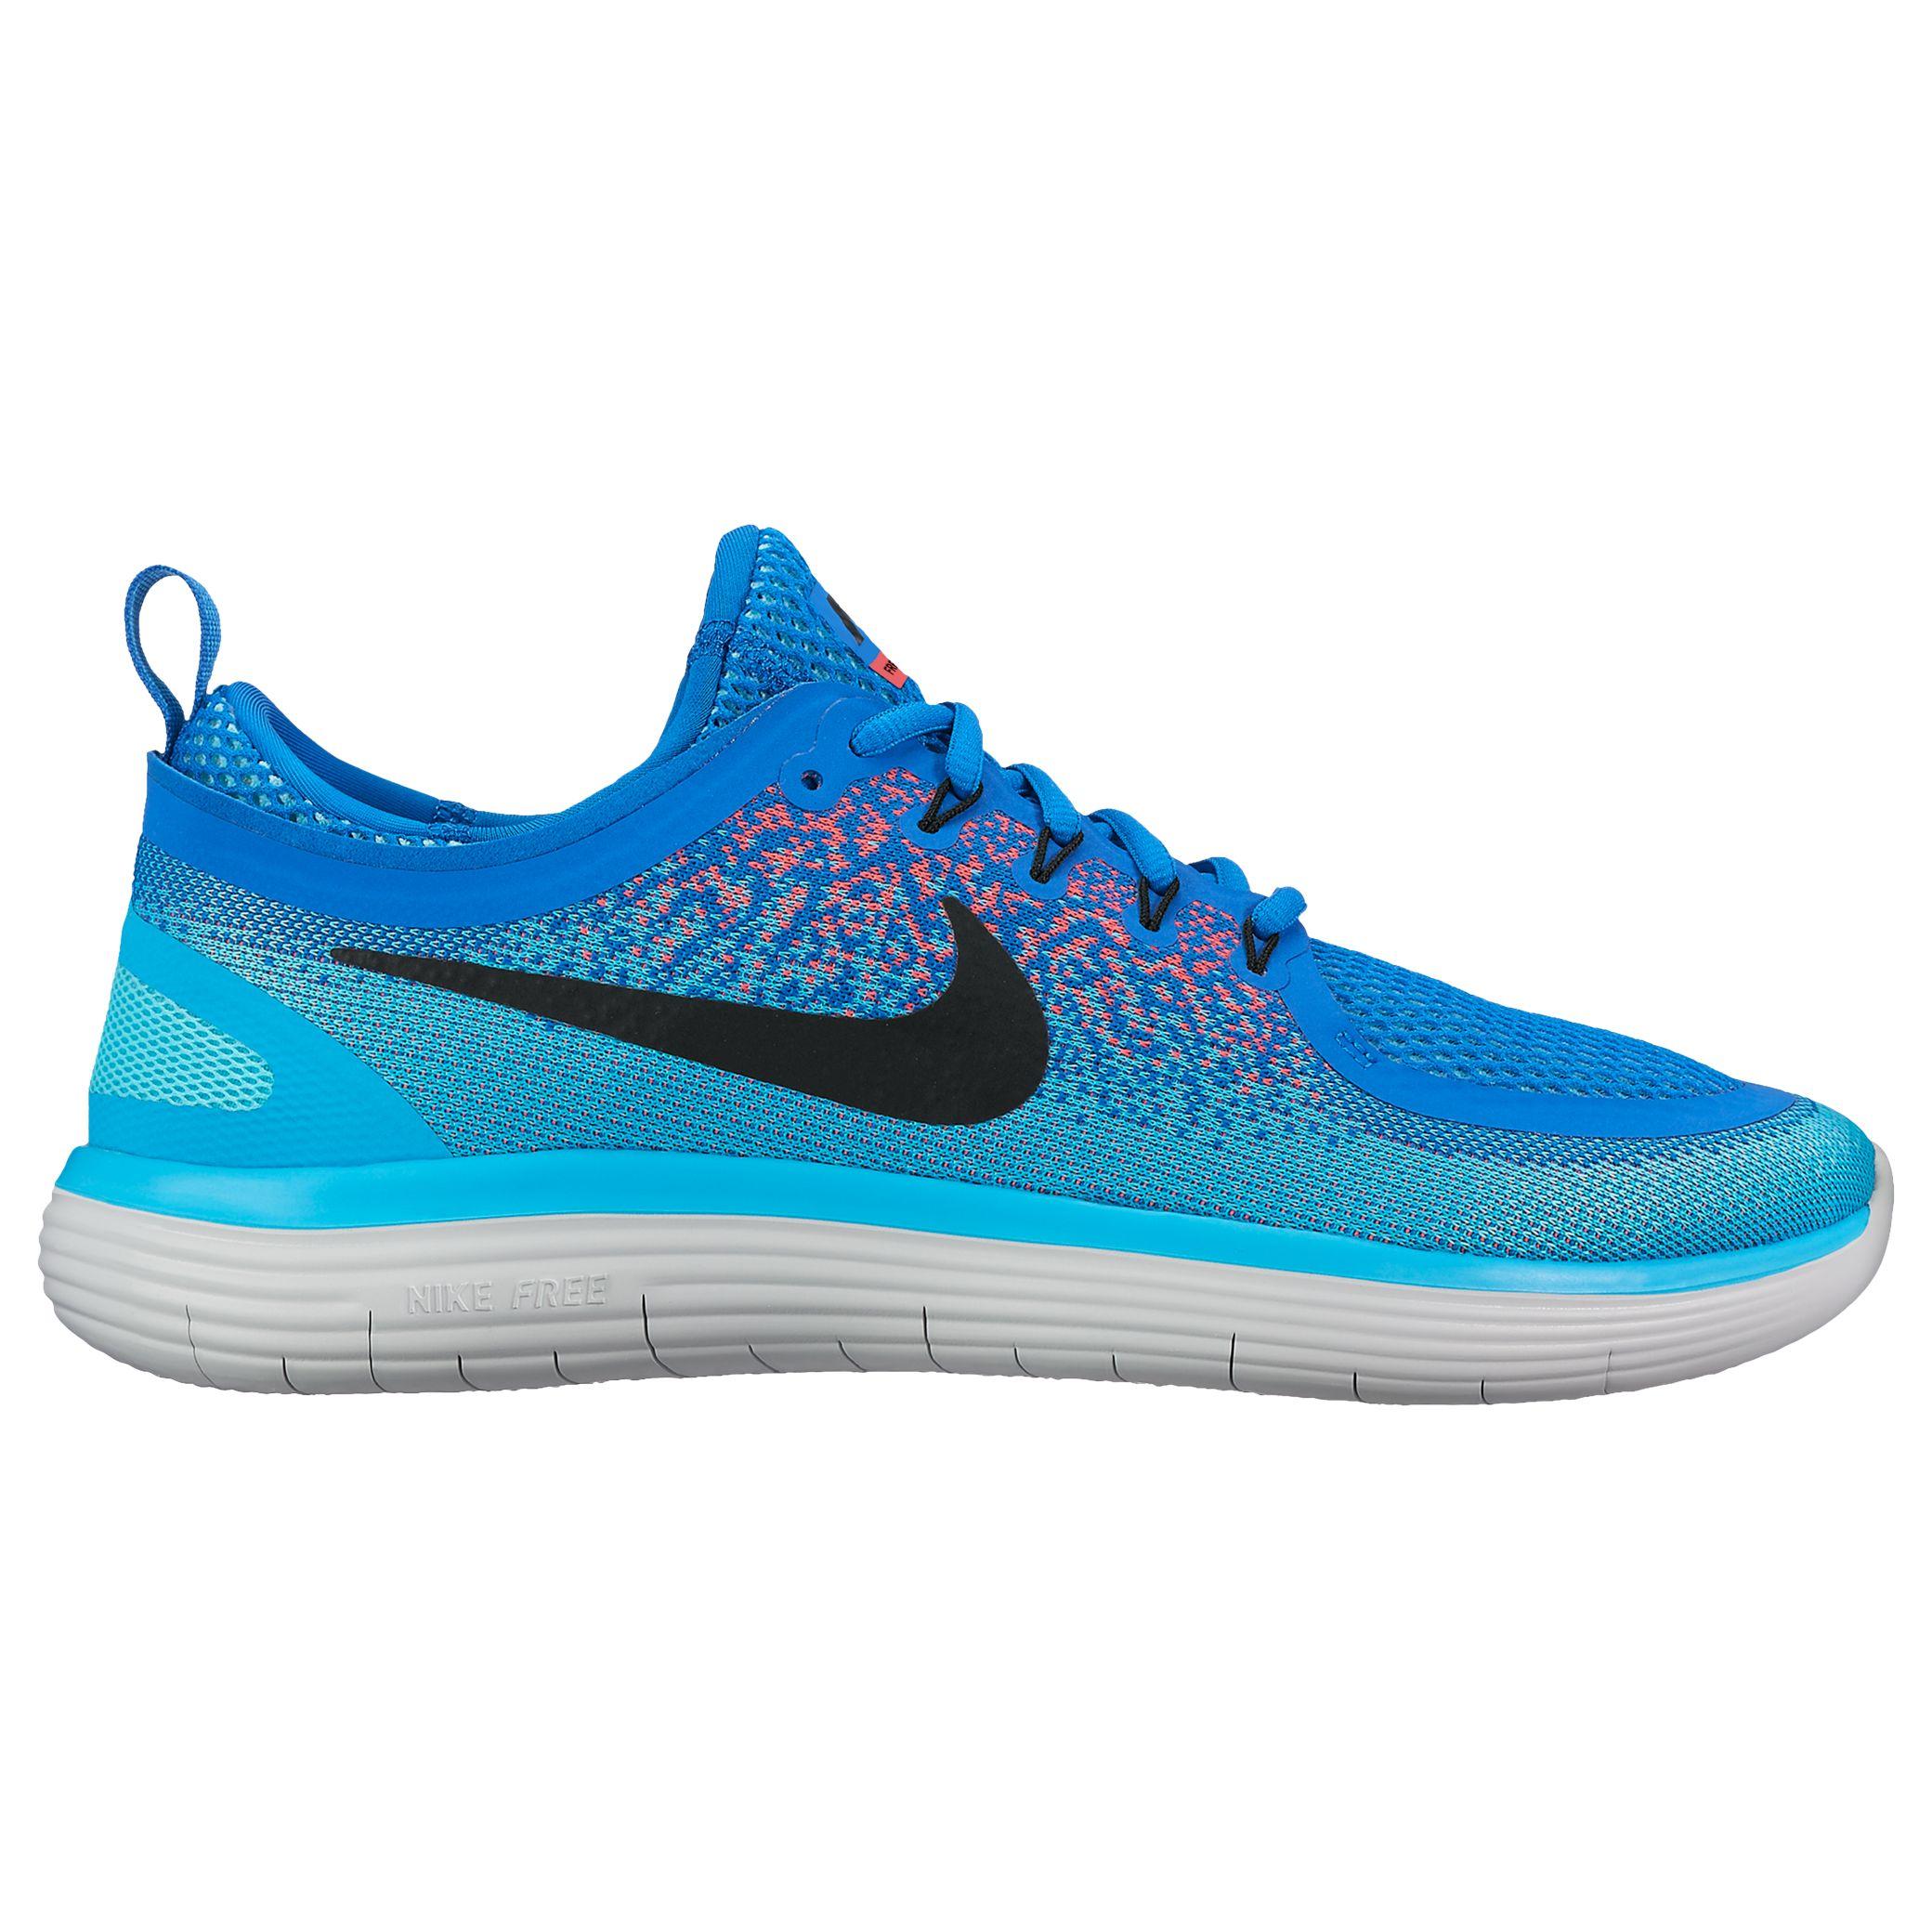 Nike Free Run Sneakers,2017 Nike Free RN Distance 2 Men's